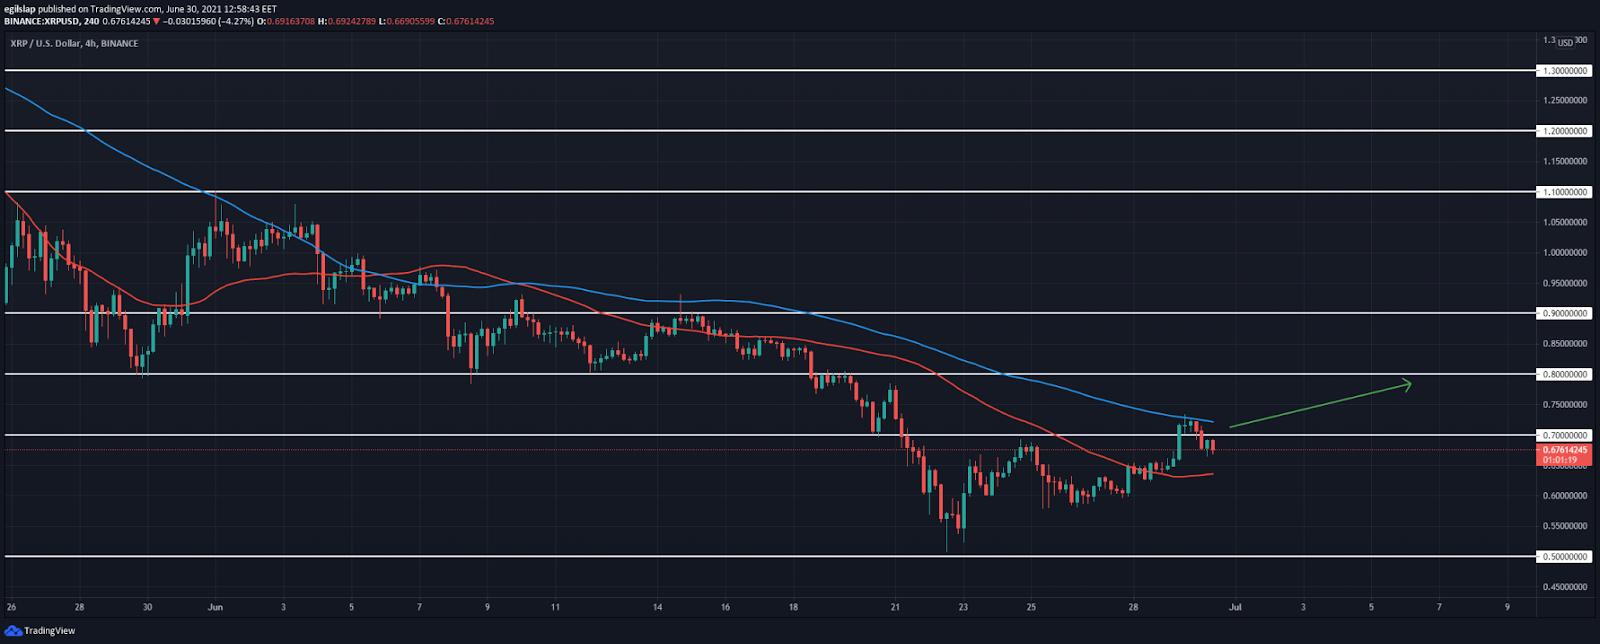 Ripple price analysis: Ripple breaks above $0.70, prepares to spike higher?